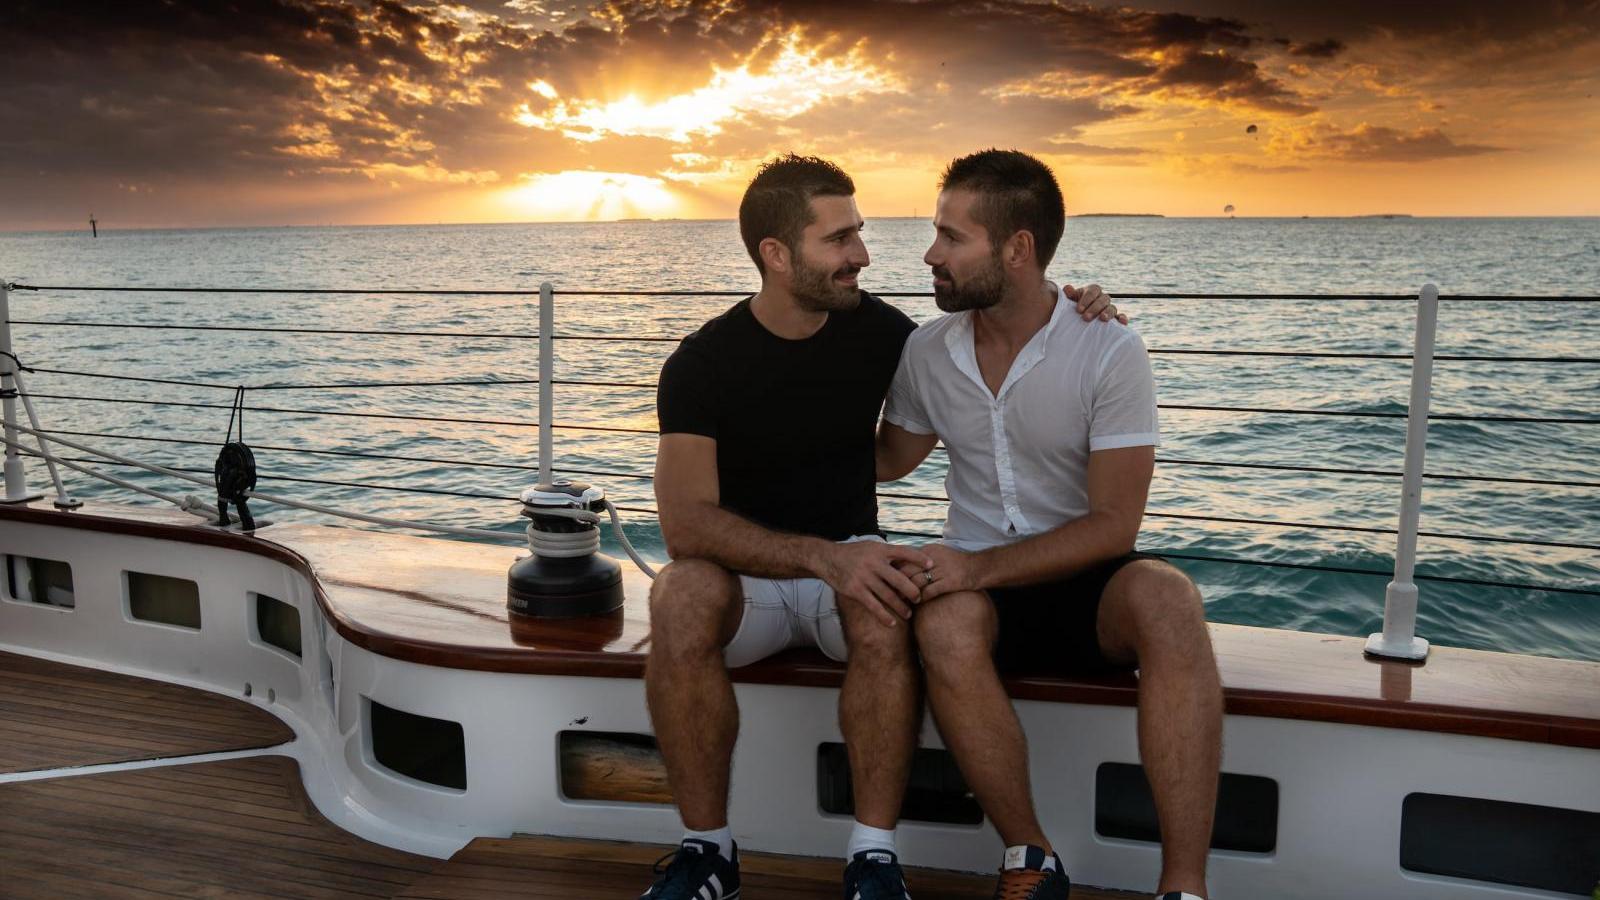 Romantic sunset cruise in Sarasota